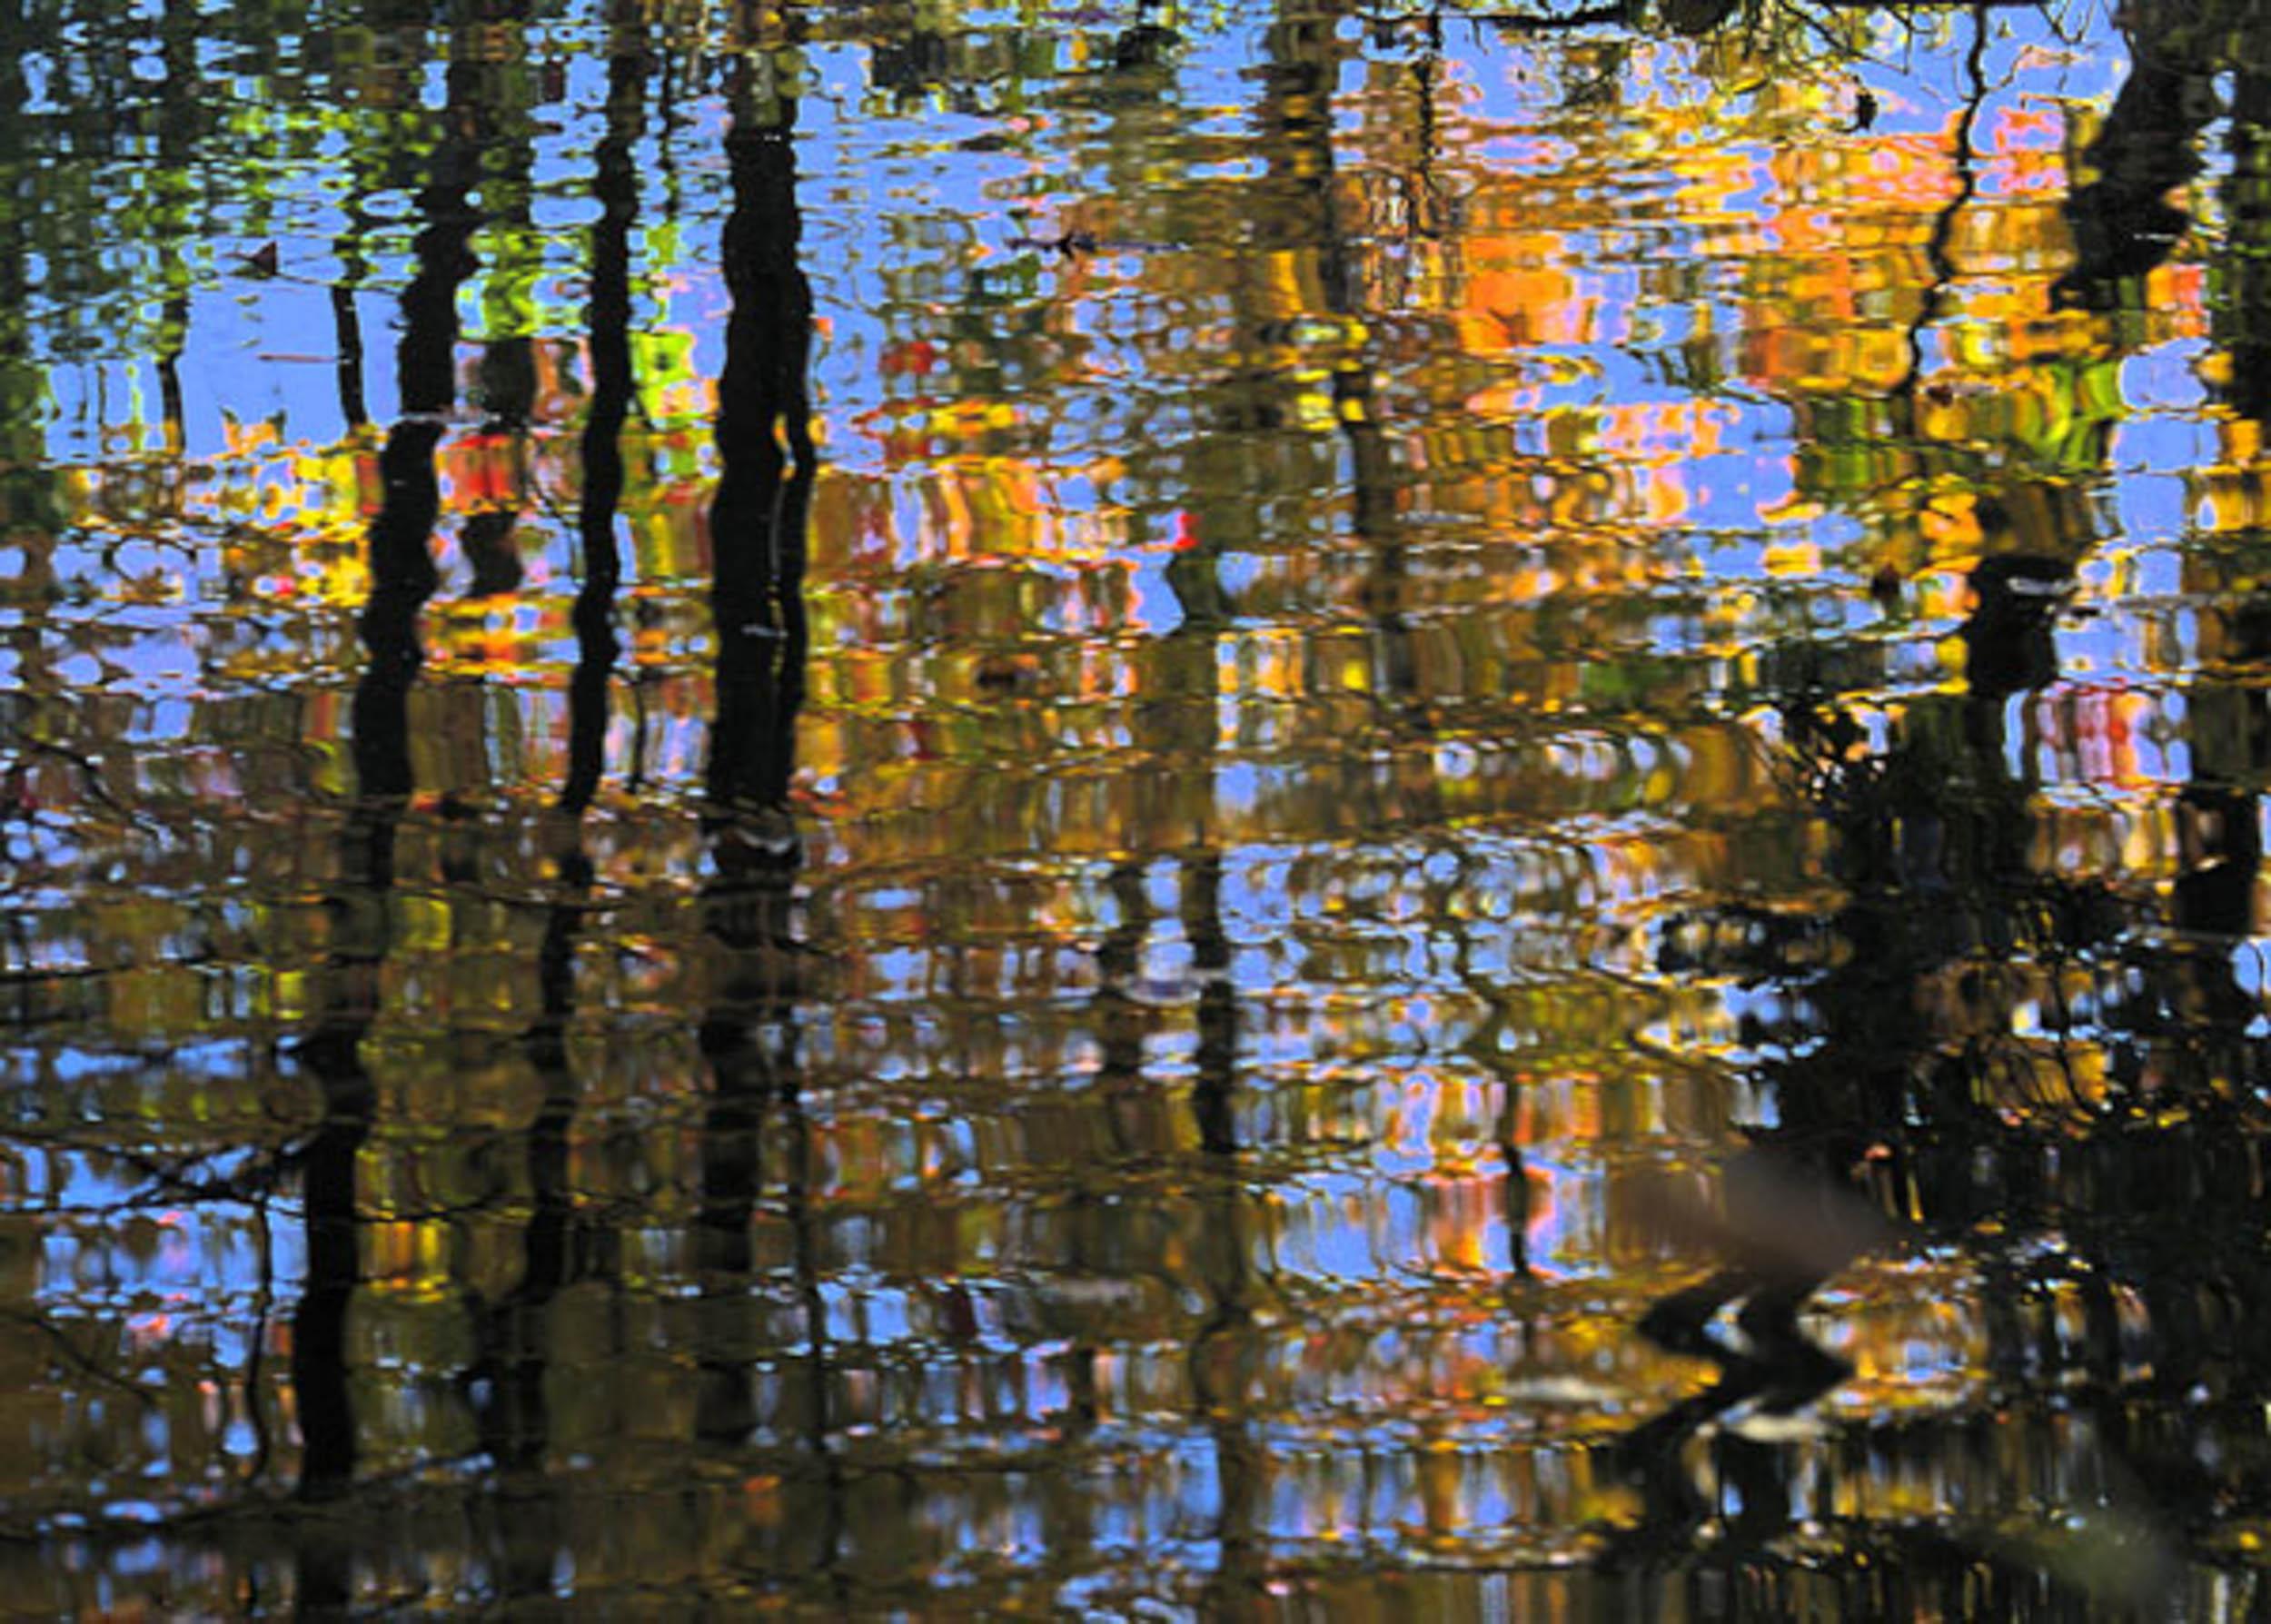 AutumnReflection1.jpg